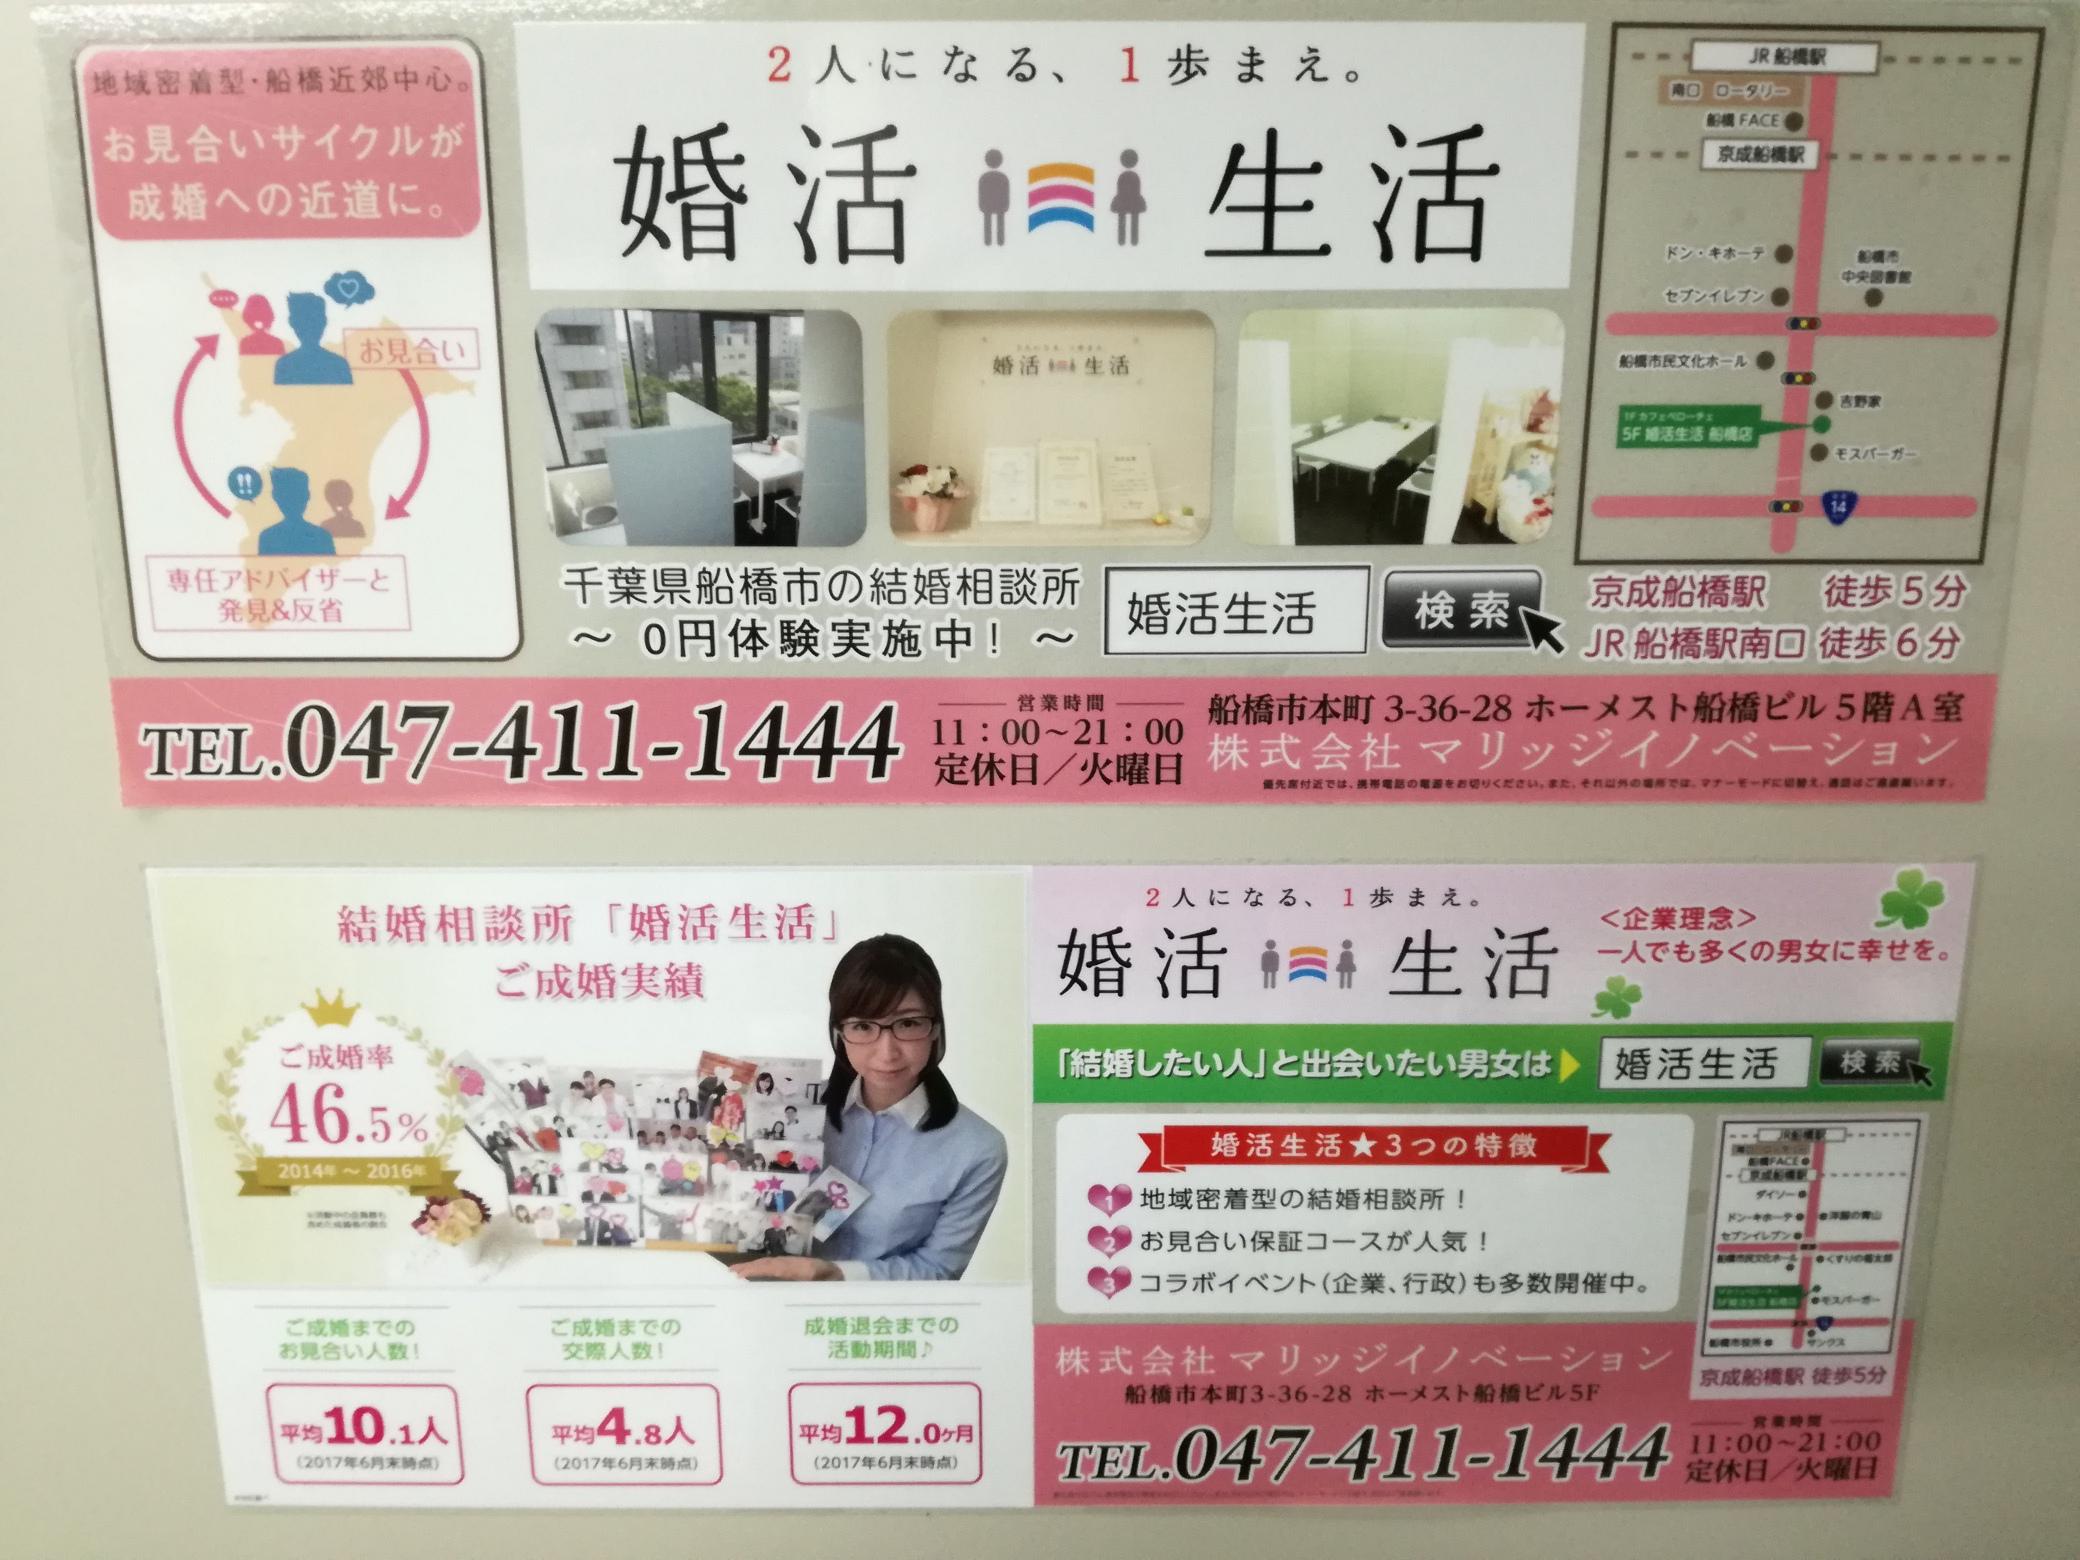 京成バス広告新旧